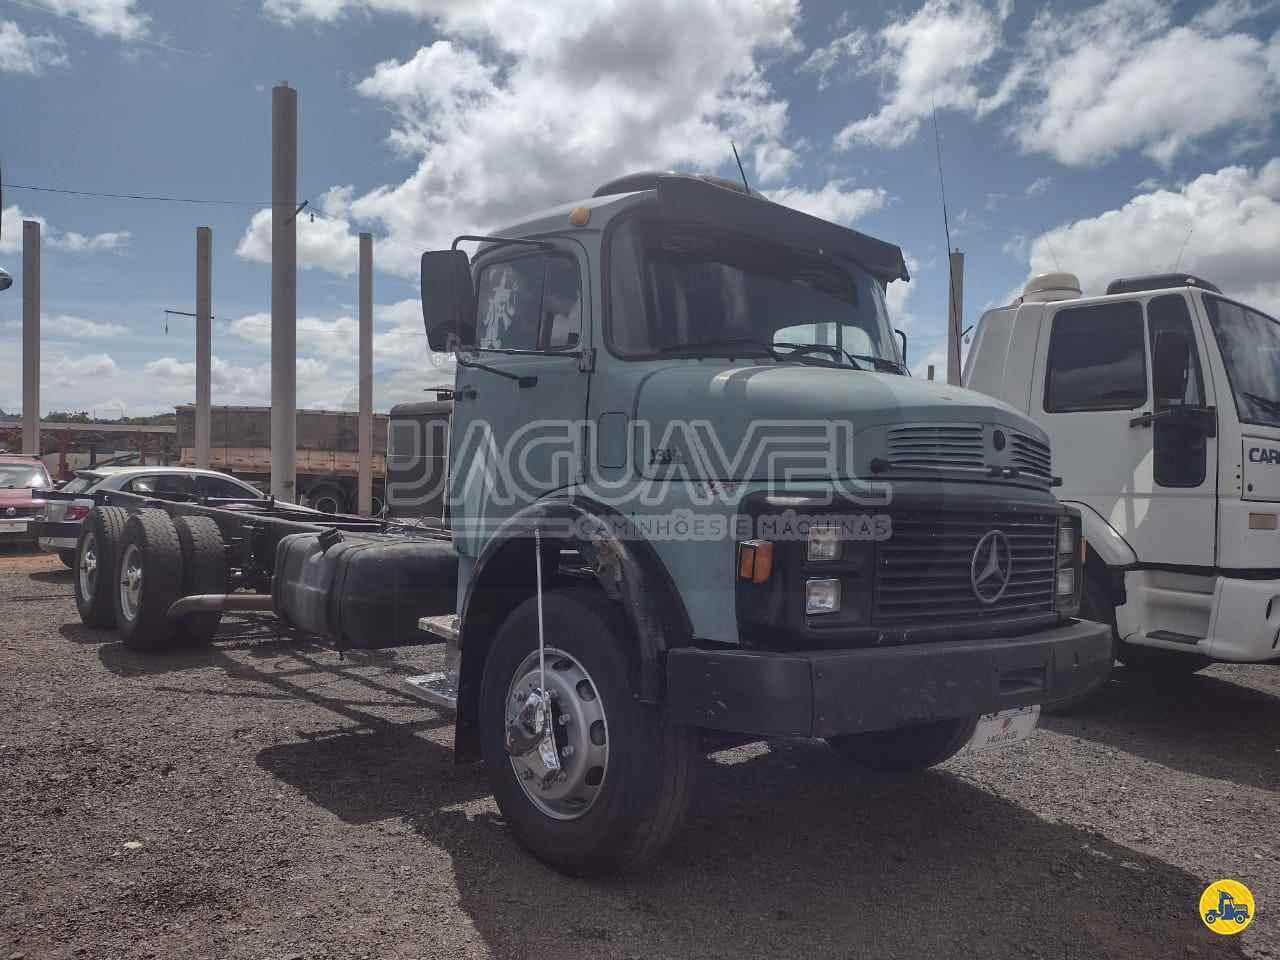 CAMINHAO MERCEDES-BENZ MB 1314 Chassis Truck 6x2 Jaguavel Caminhões JAGUARIAIVA PARANÁ PR